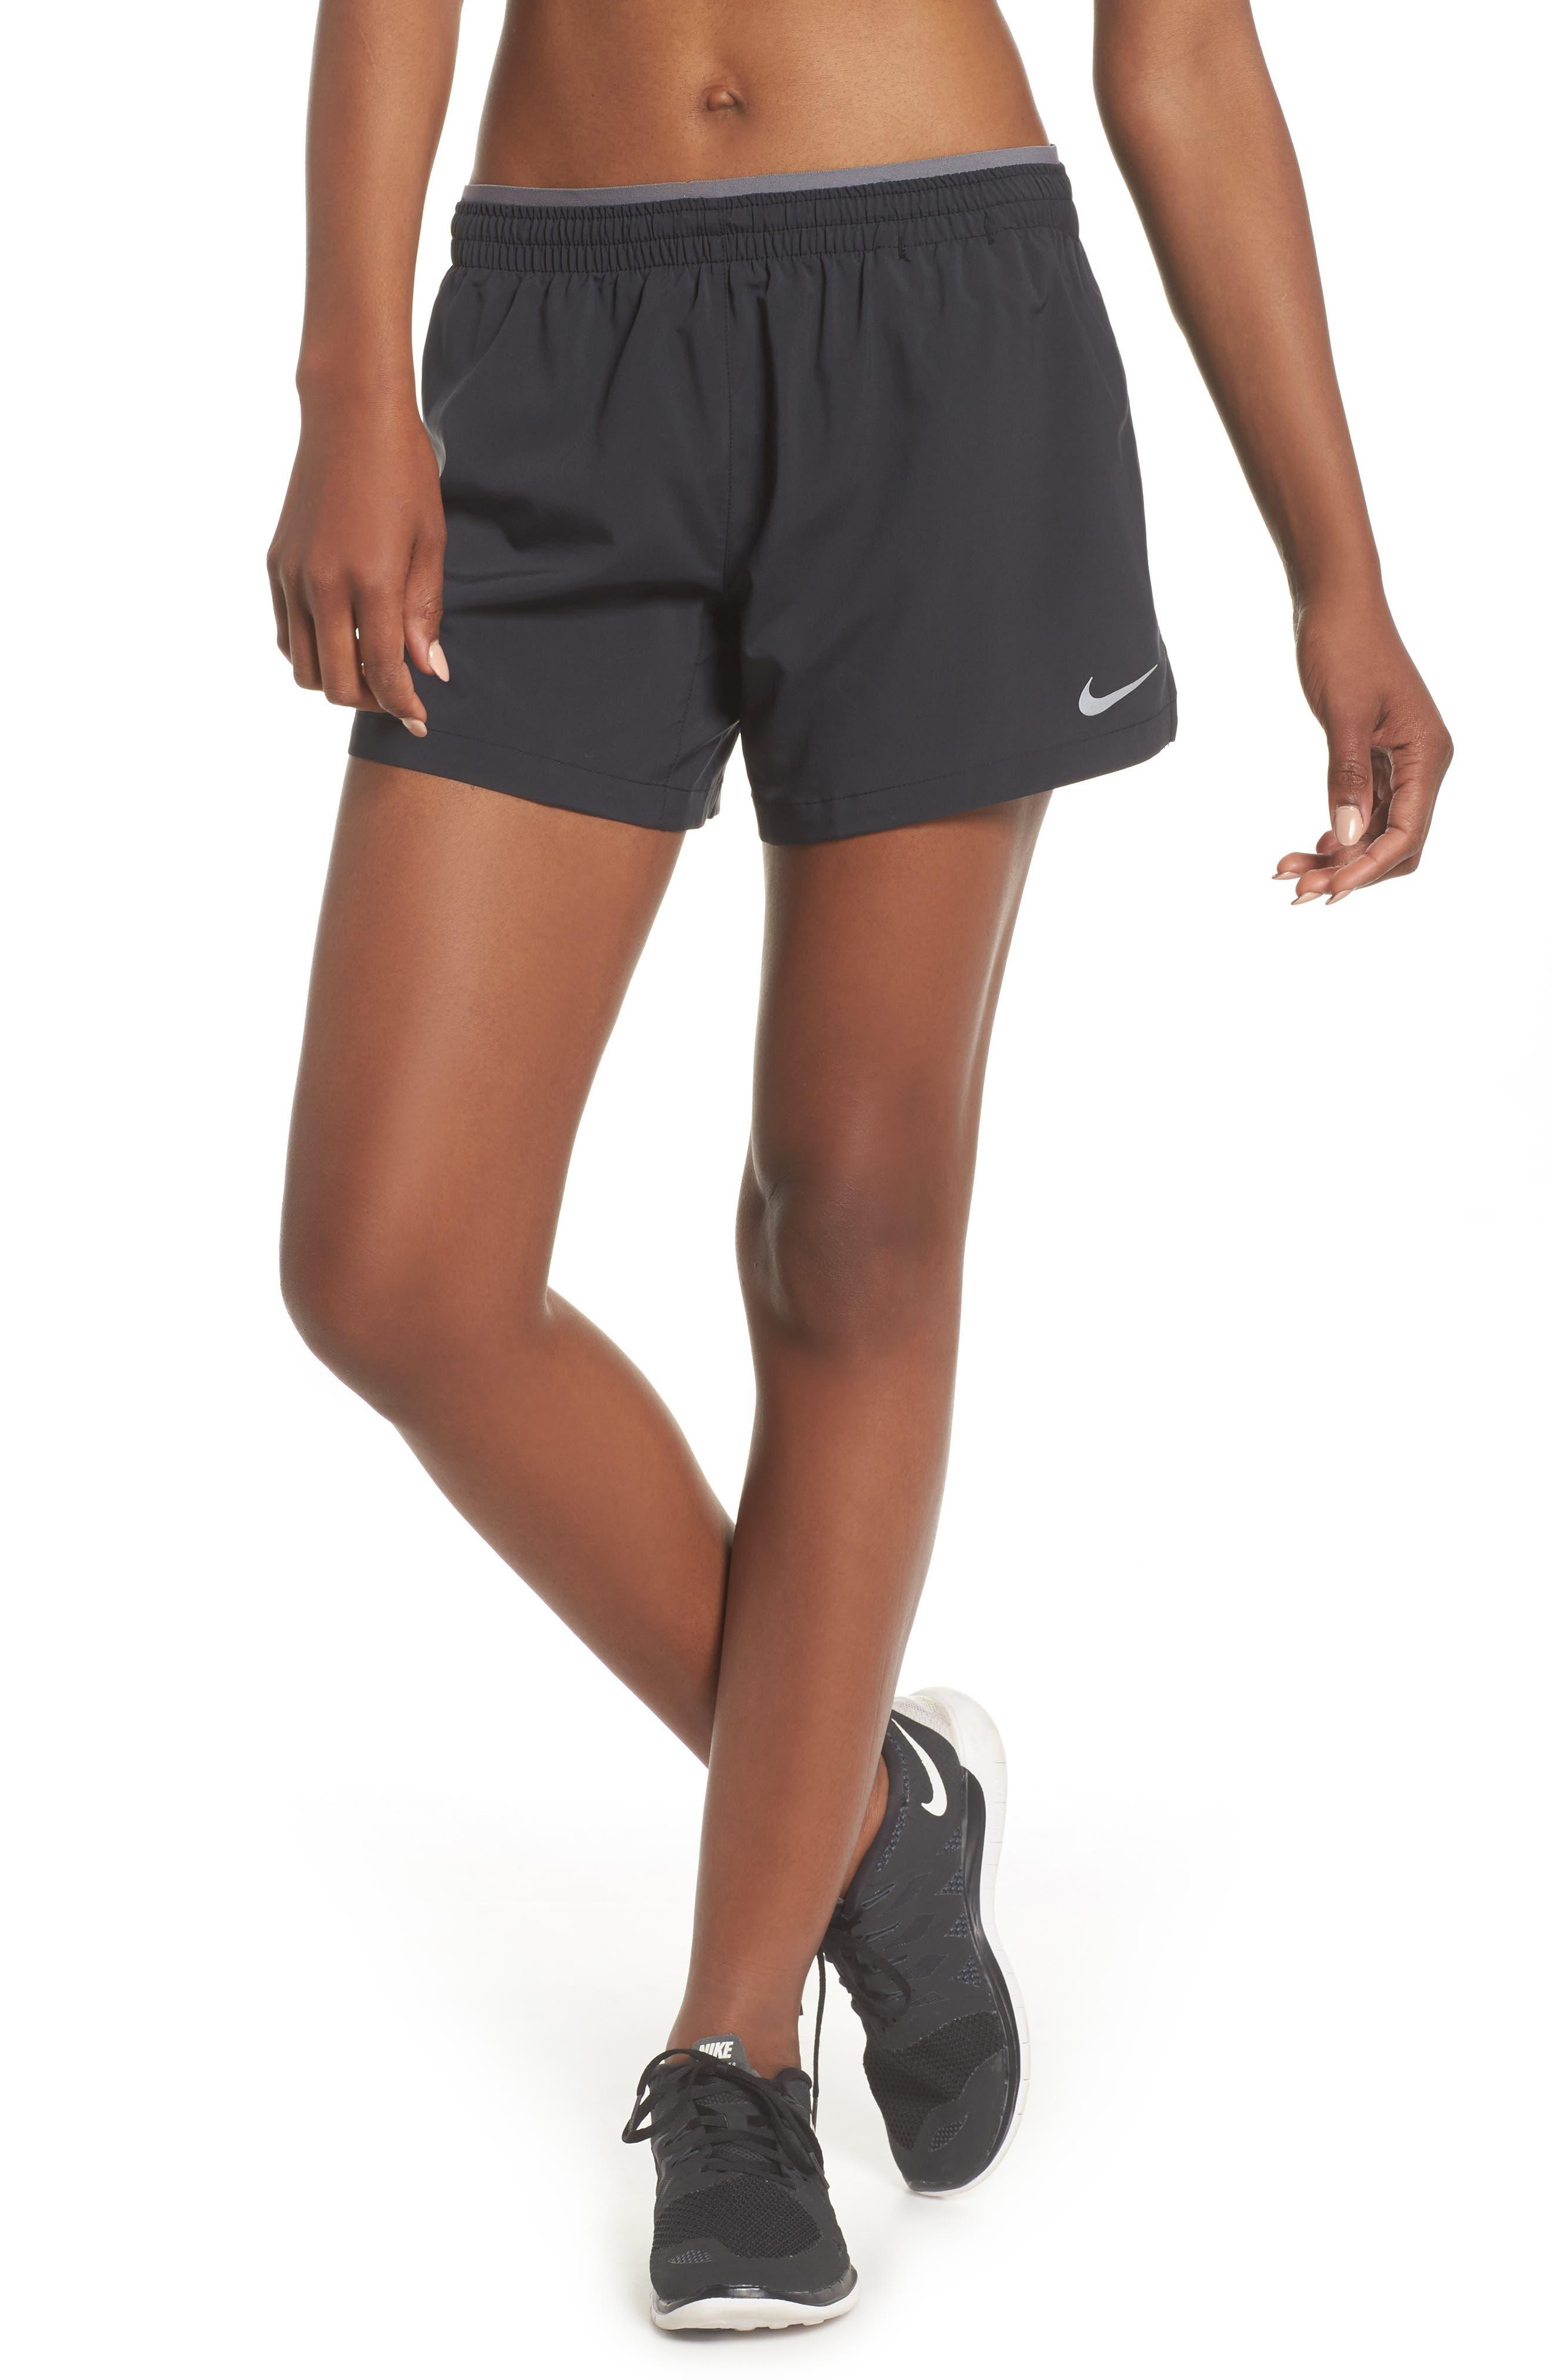 Flex 5-Inch Inseam Running Shorts,                             Main thumbnail 1, color,                             BLACK/ GUNSMOKE